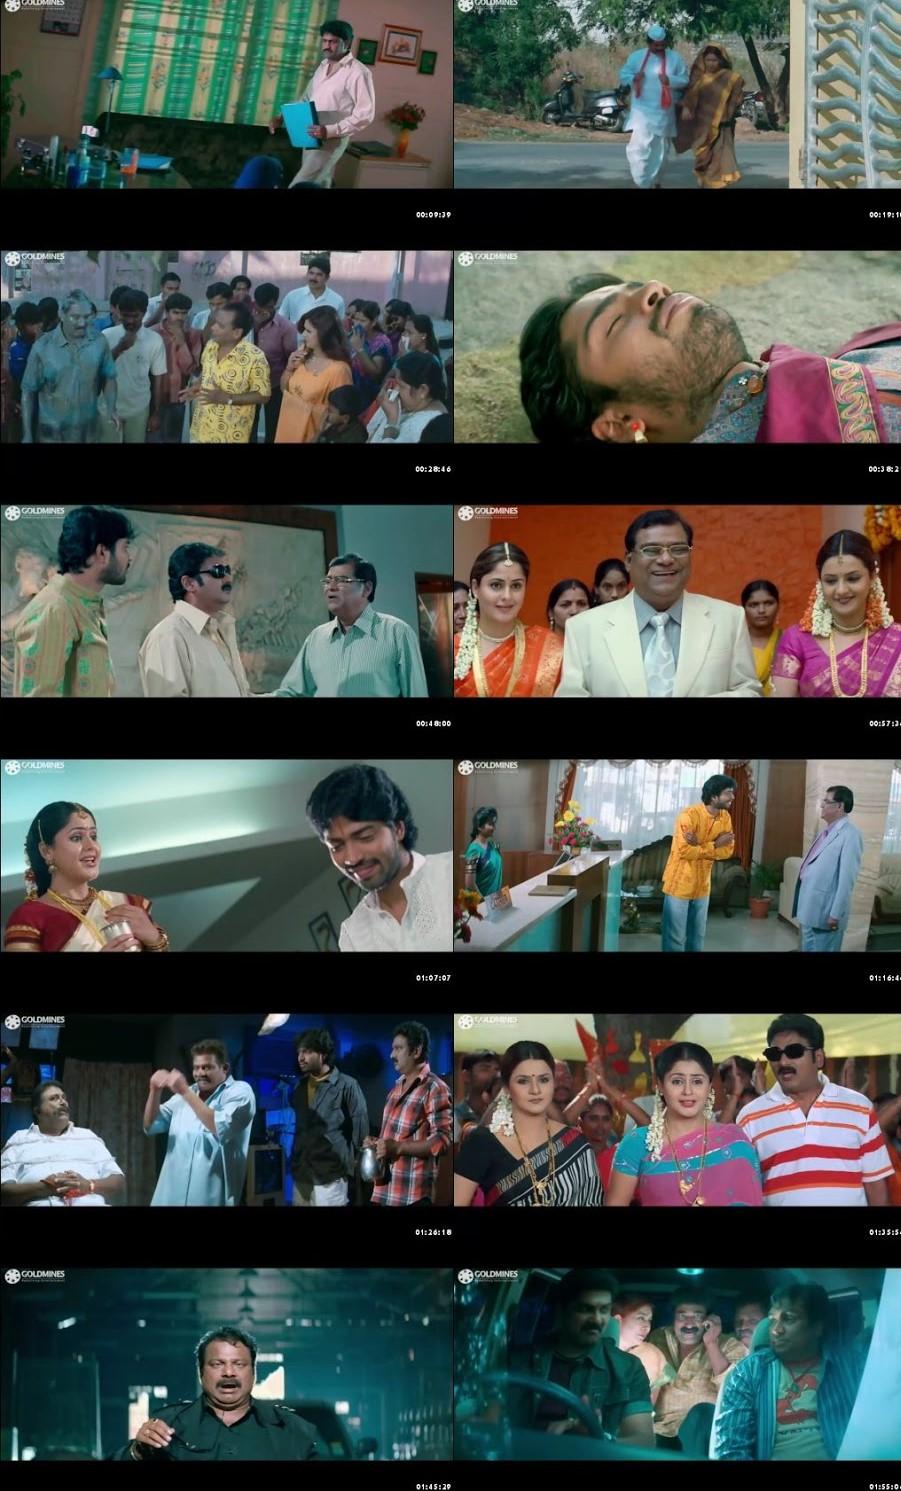 Bommana Brothers Chandana Sisters 2008 Hindi Dubbed Movie Download HDRip 720p